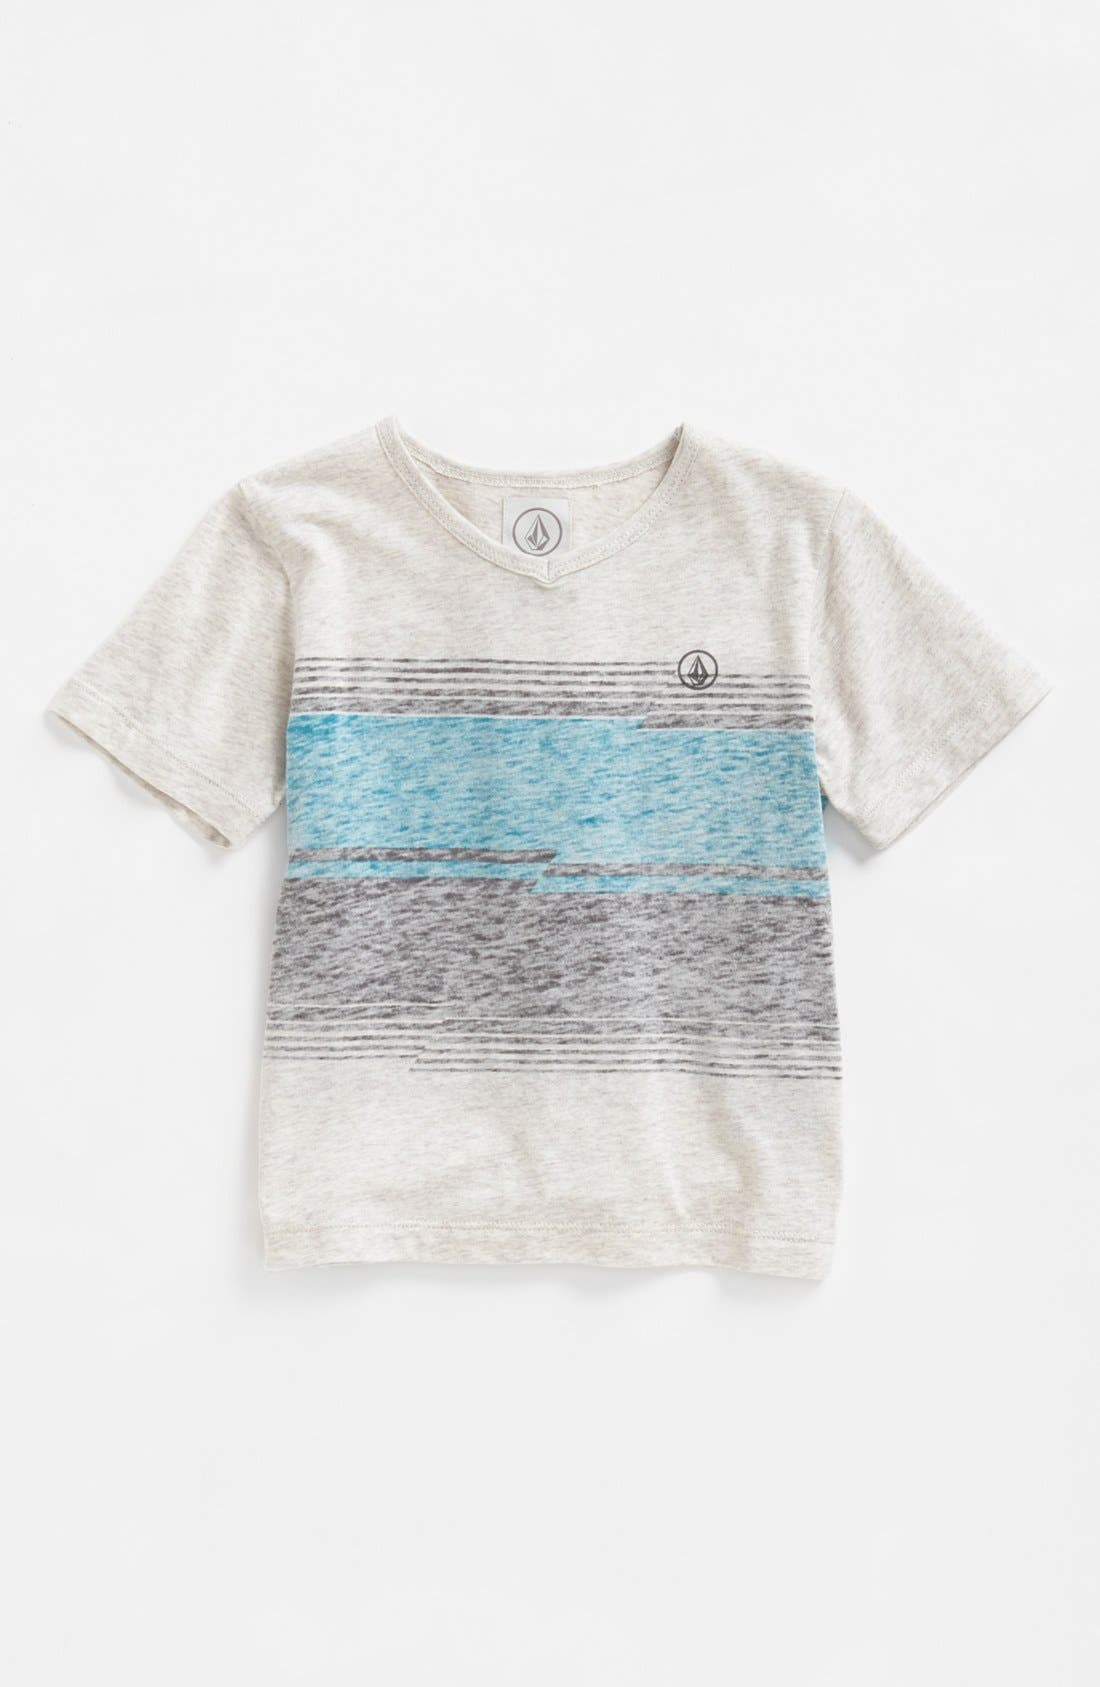 Alternate Image 1 Selected - Volcom 'Inferno' V-Neck T-Shirt (Toddler Boys)